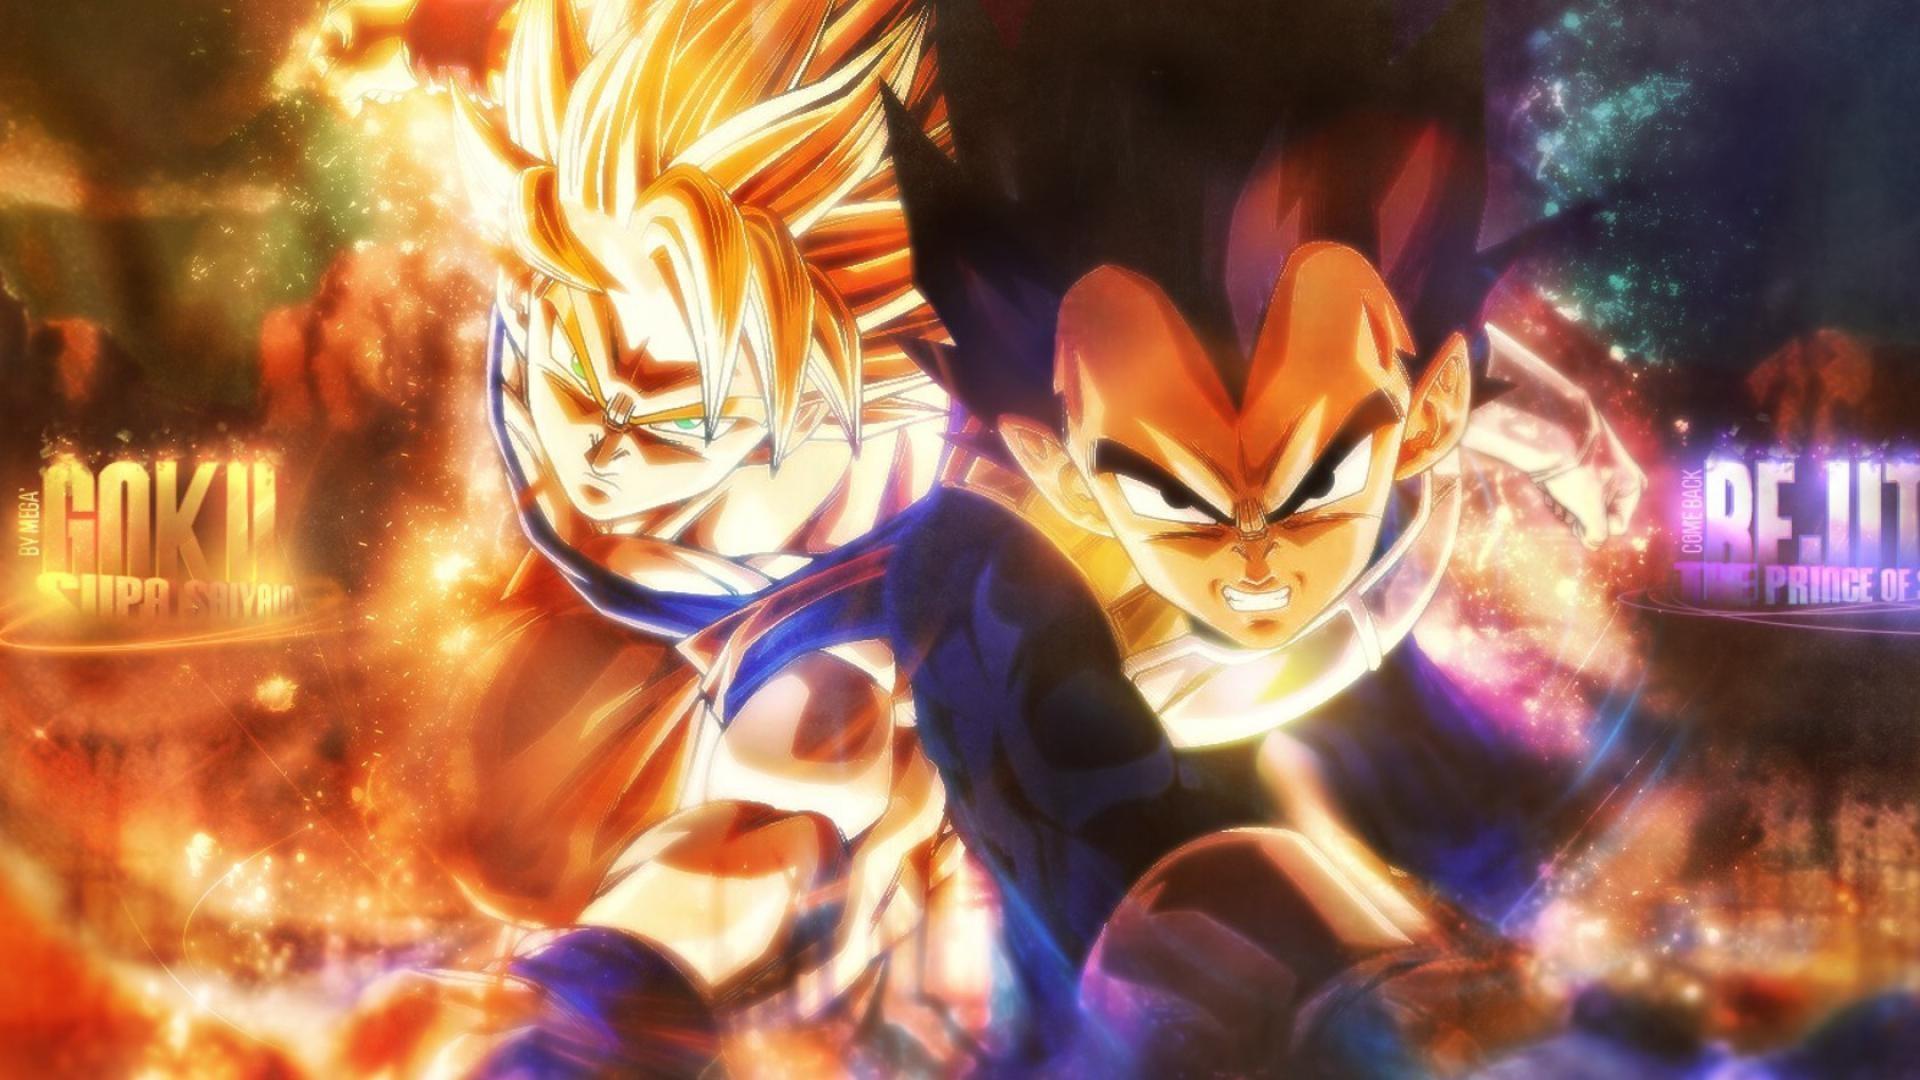 Super Saiyan Live Wallpaper Iphone X Dragon Ball Super Wallpaper Hd 53 Images